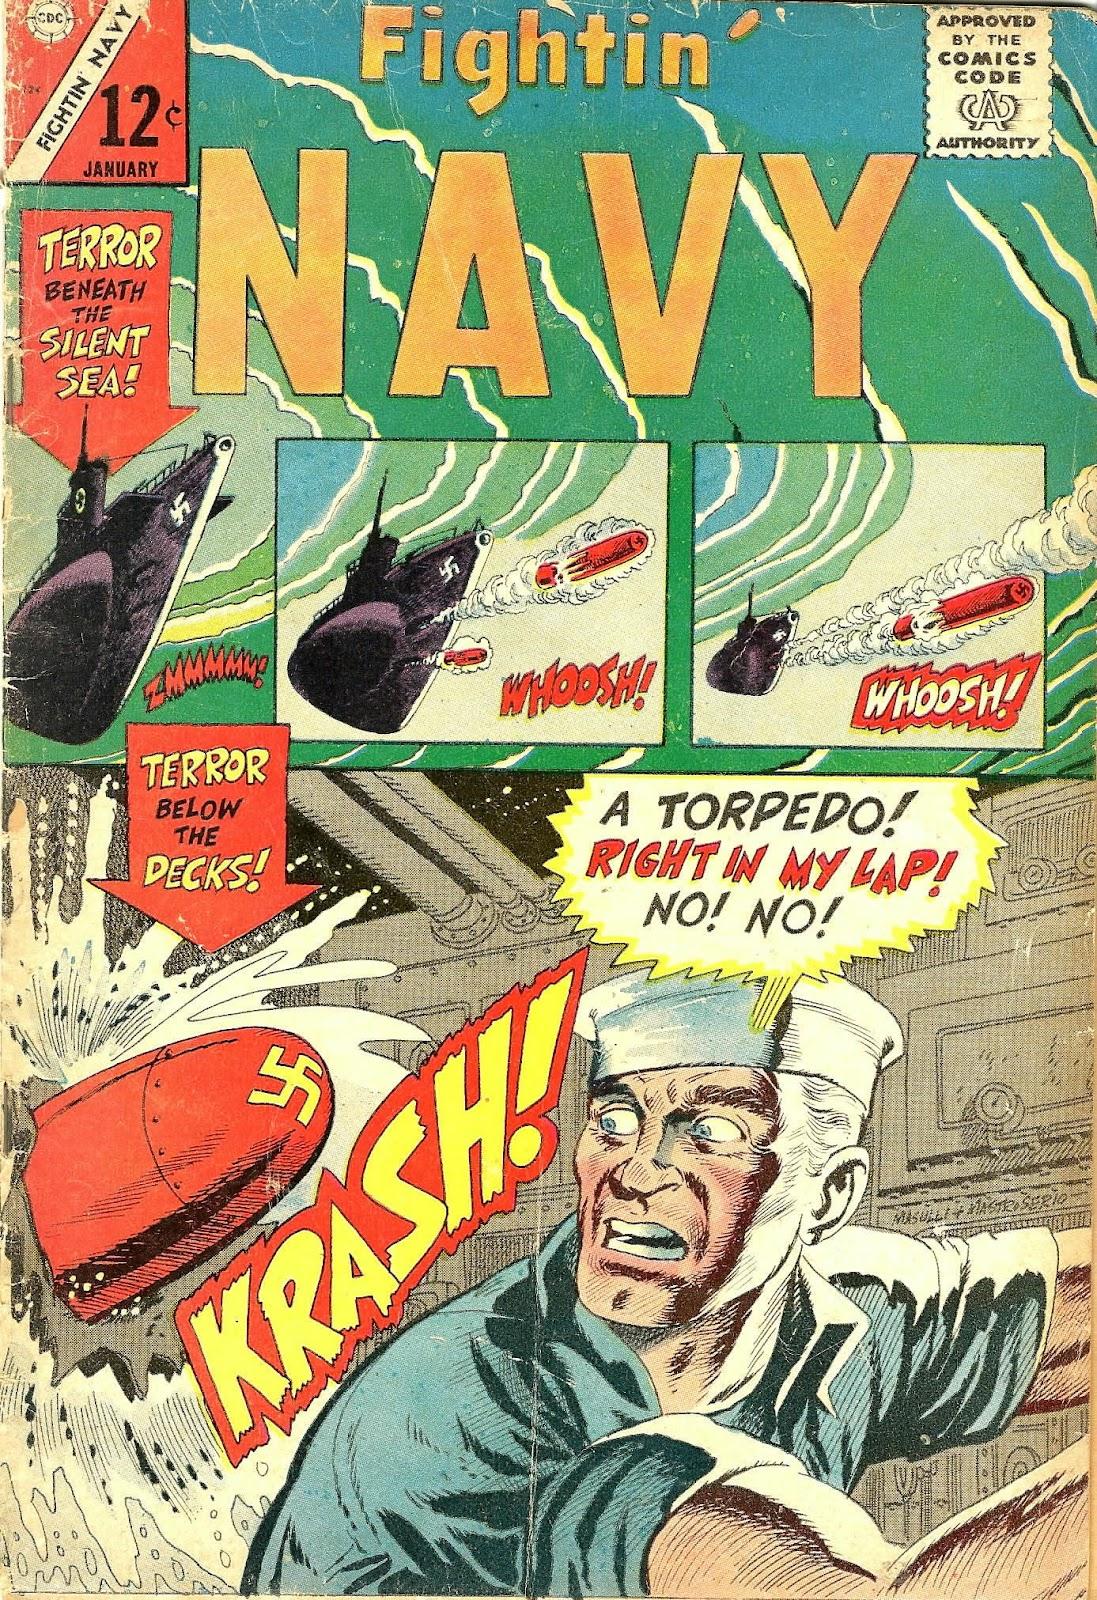 Read online Fightin' Navy comic -  Issue #124 - 1